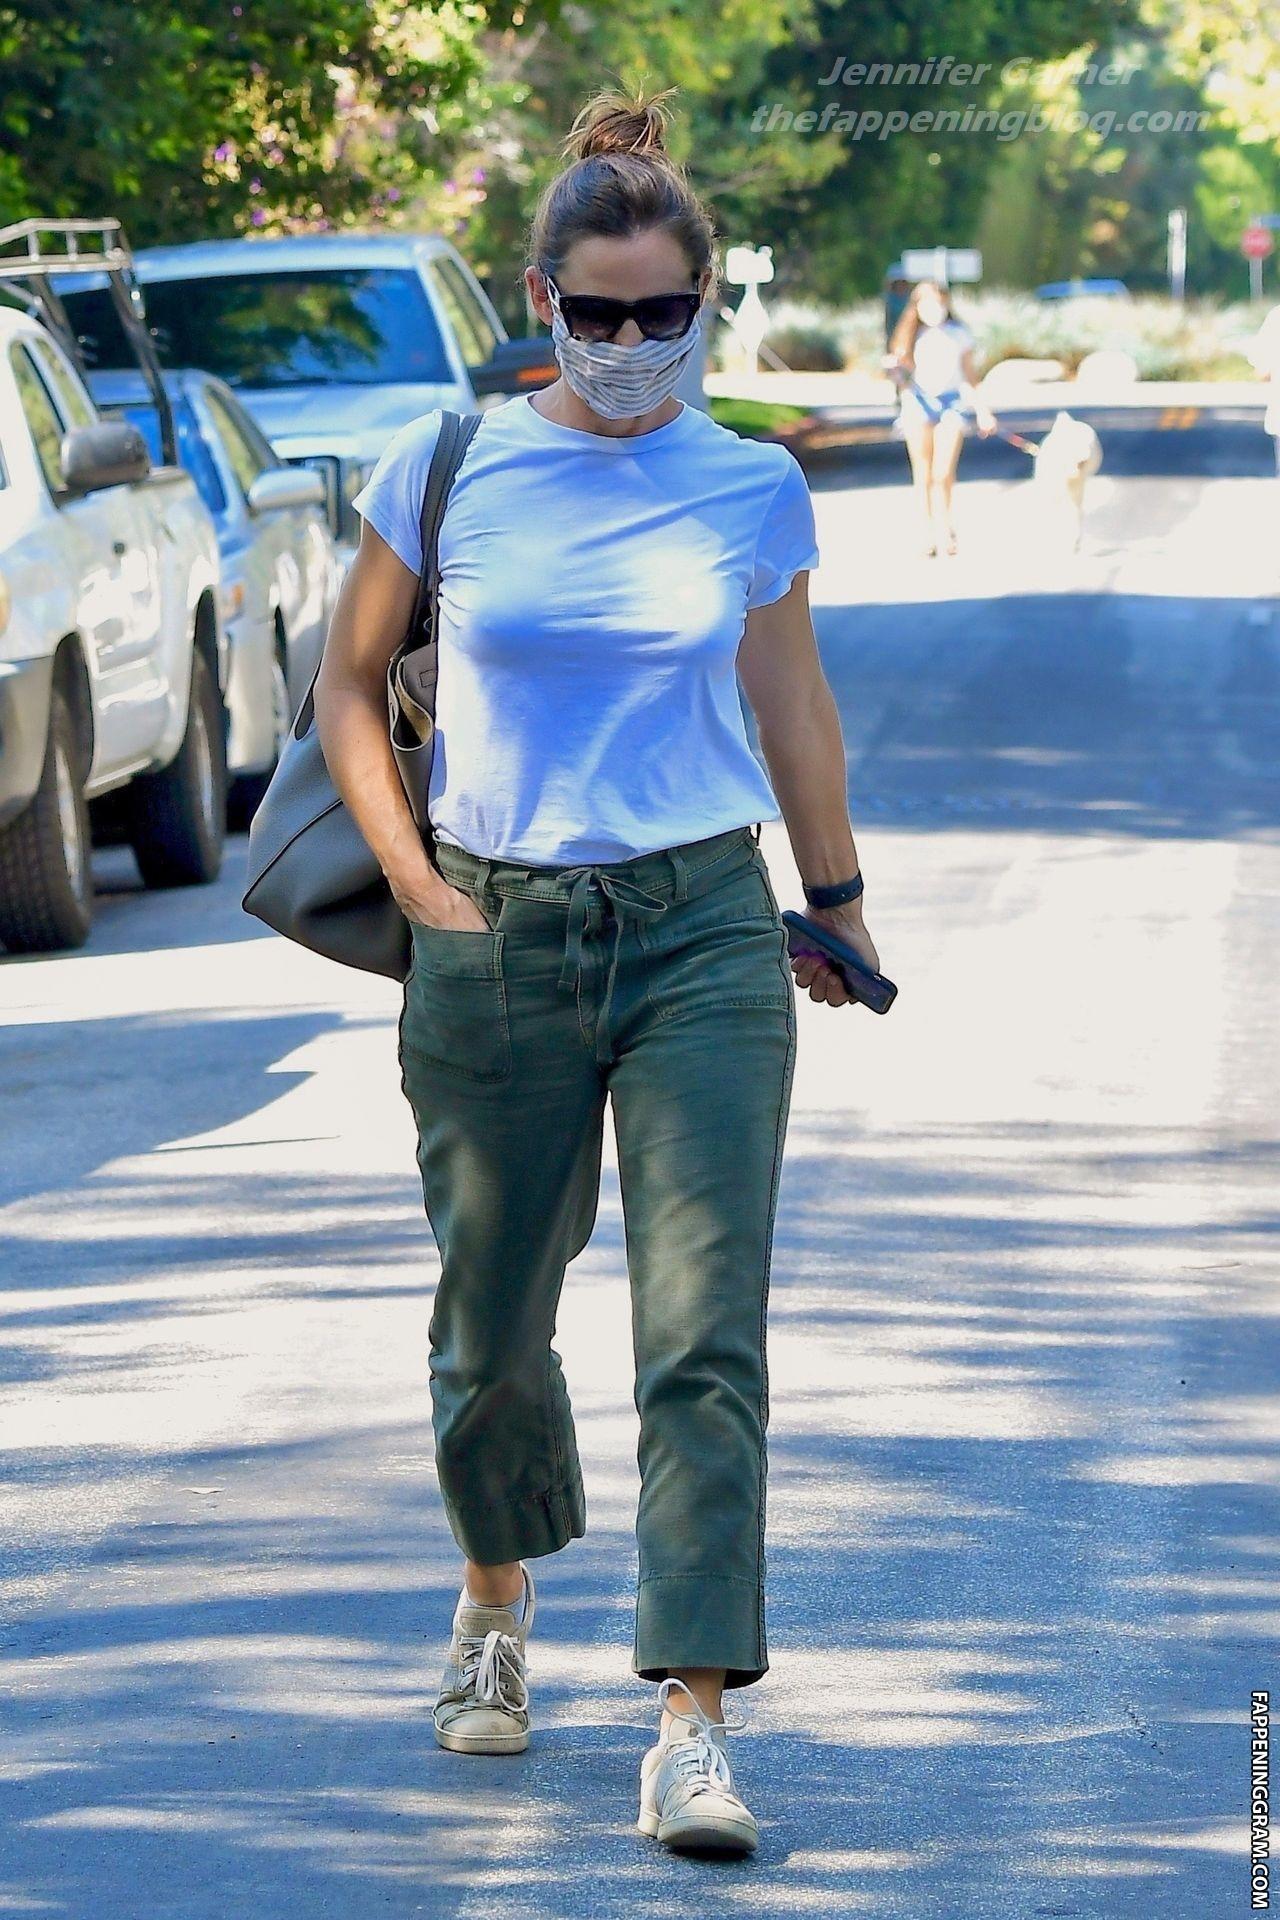 Jennifer Garner Nude The Fappening - Page 3 - FappeningGram